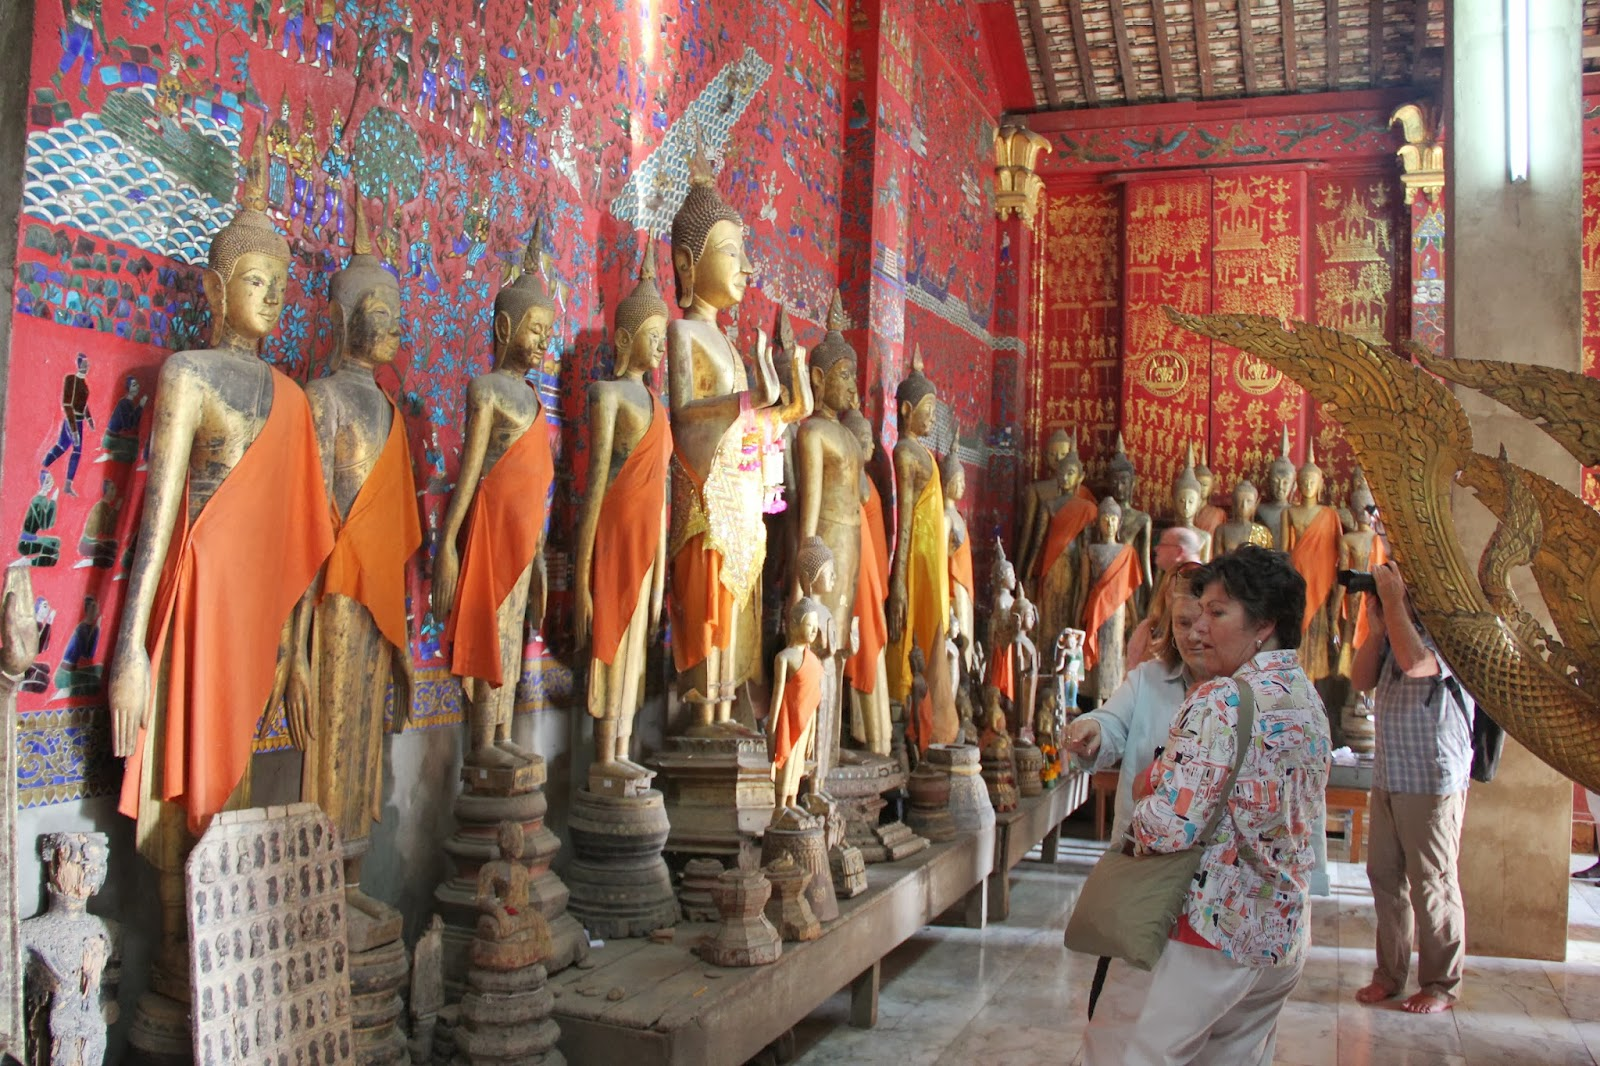 Saffron-robed Buddha statues at Wat Xien Thong.